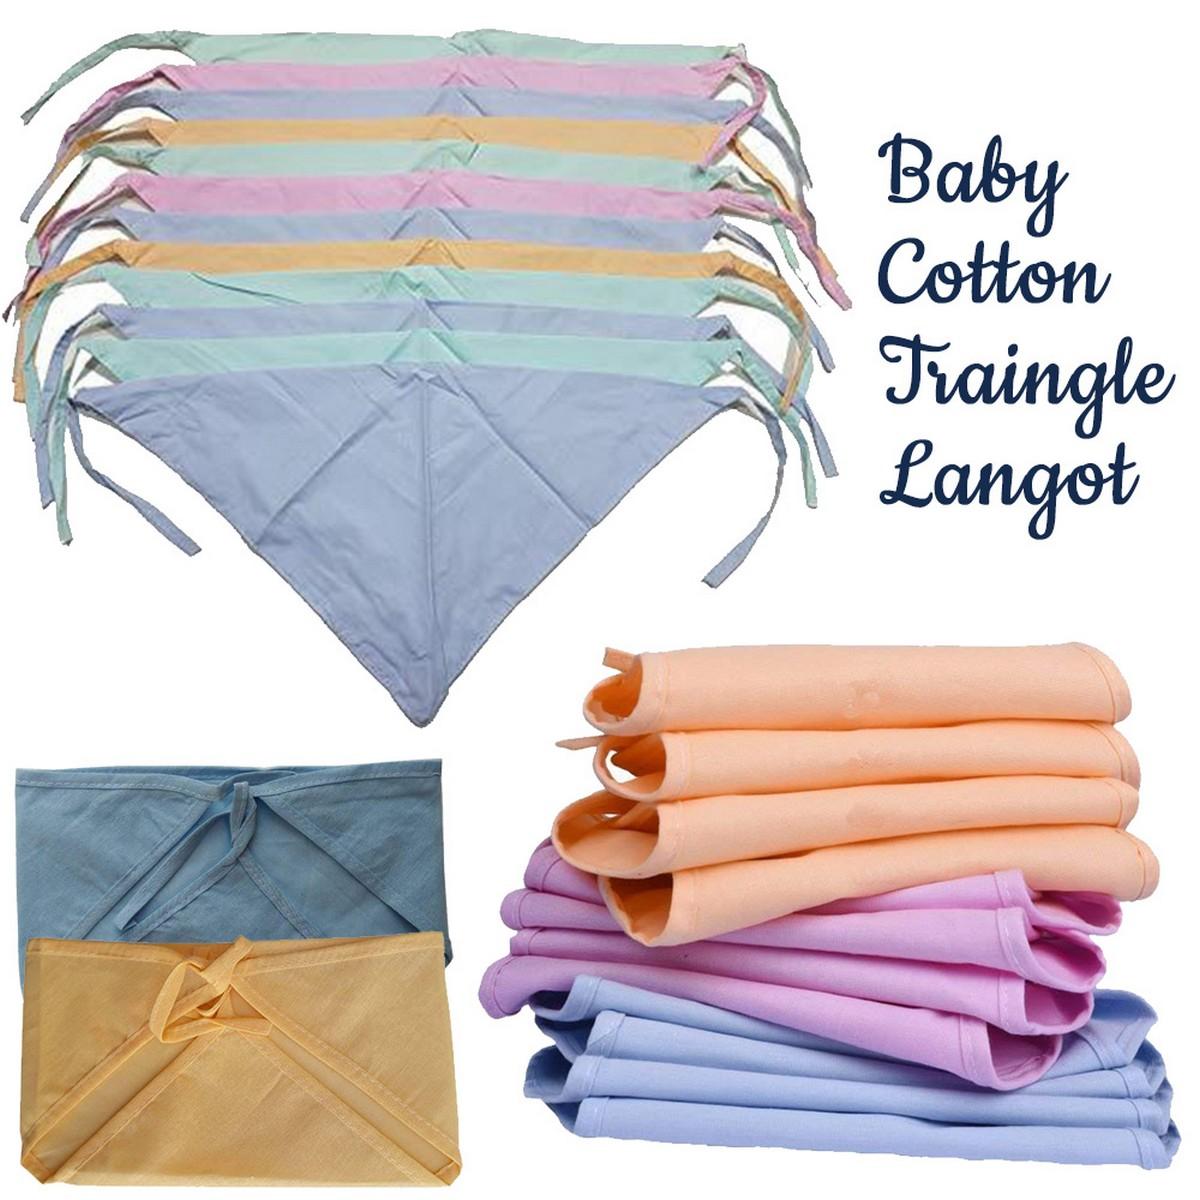 Baby Langot Cotton Triangle Shape Nappy for New Born Baby Pack of 6 Pcs 12 Pcs 18 Pcs 24 Pcs- Cotton Cloth Diapers/Langot for Babies 0-6 Months Double Layer Nappies Washable and Reusable Langoties (Triangle Shape)